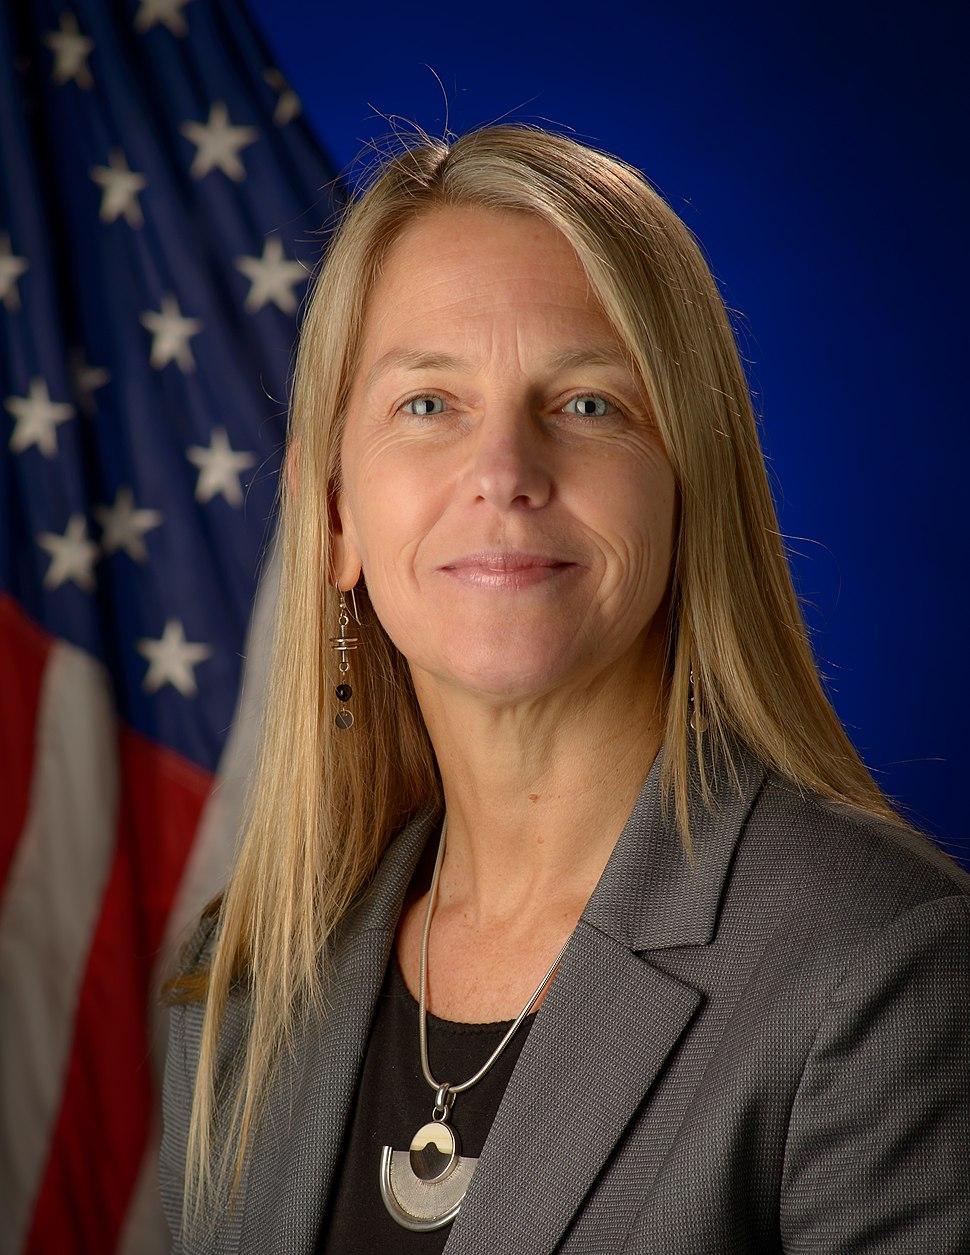 Dava Newman, official portrait